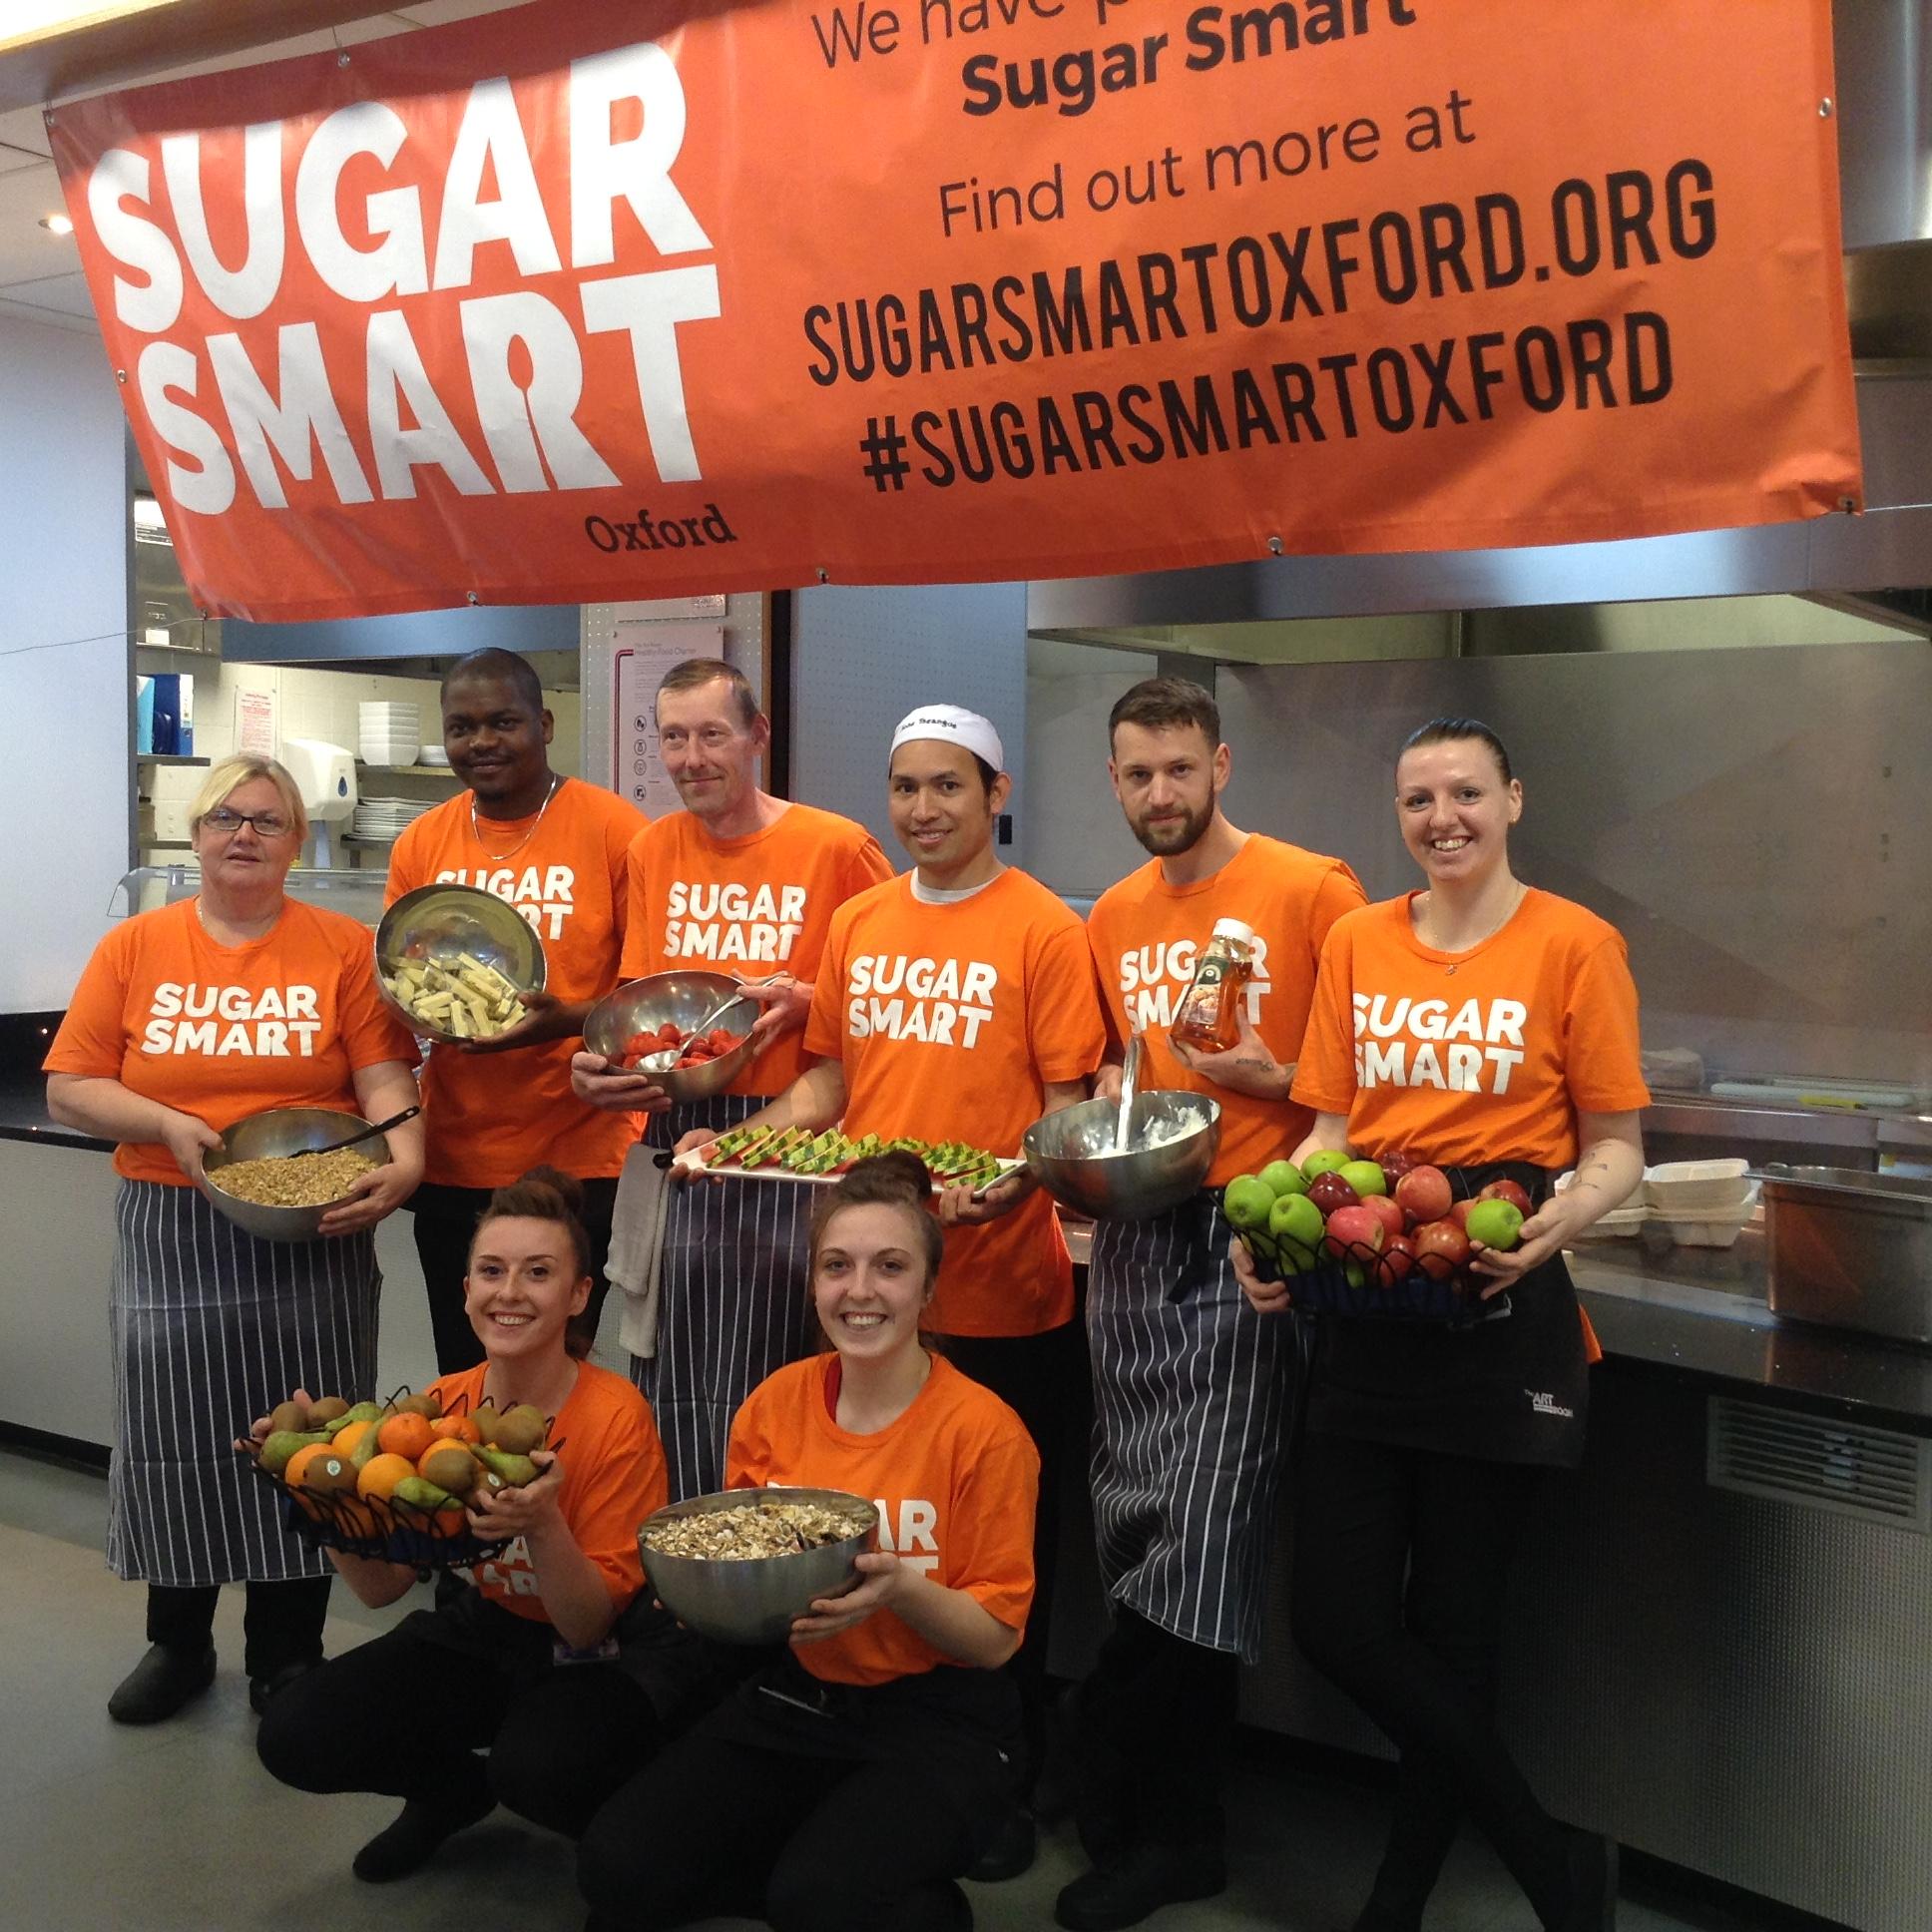 Unipart has got behind SUGAR SMART